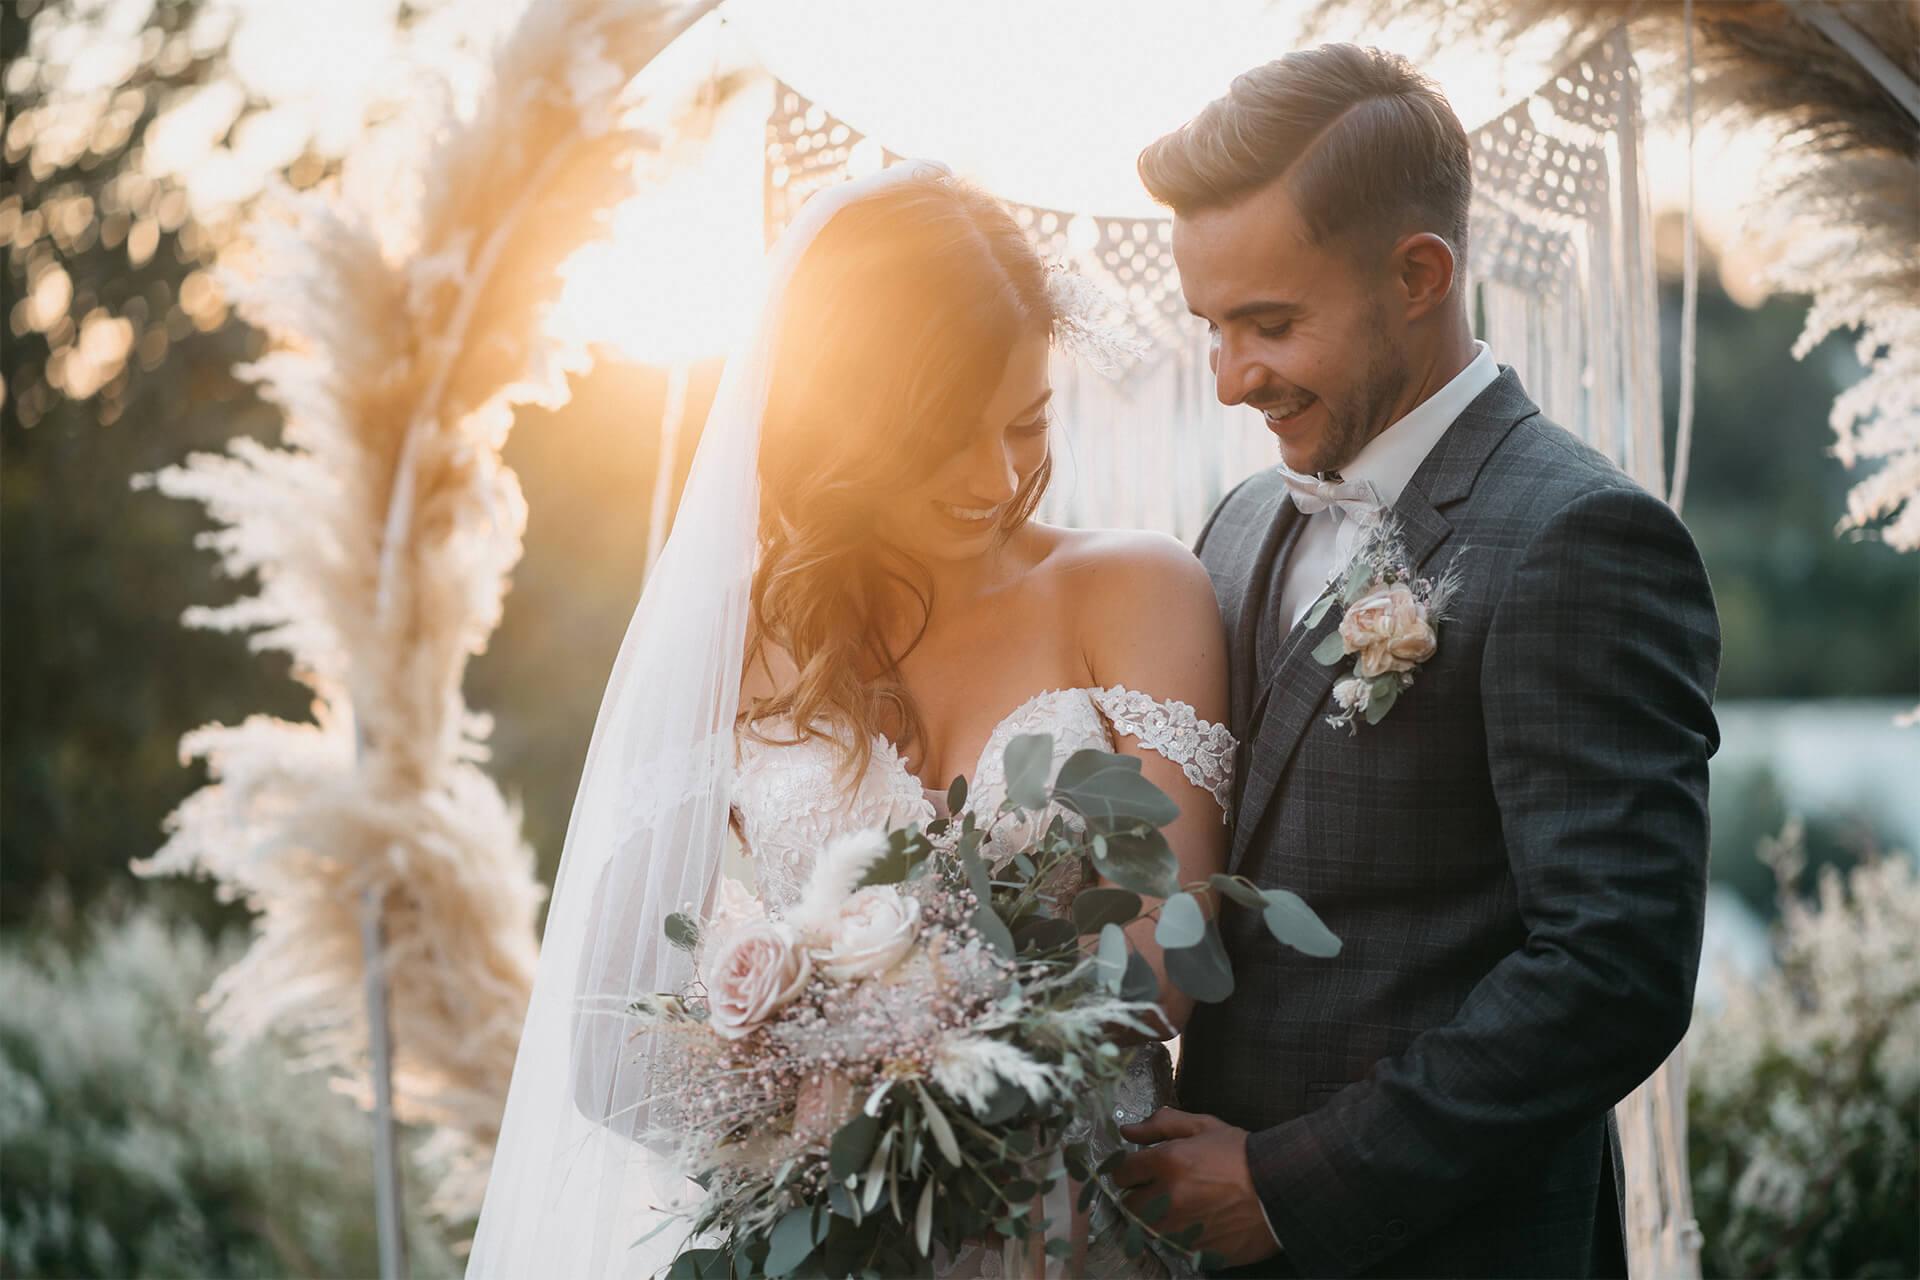 Hochzeitsreportagen in ganz Hessen | Pascal Bindel Fotografie